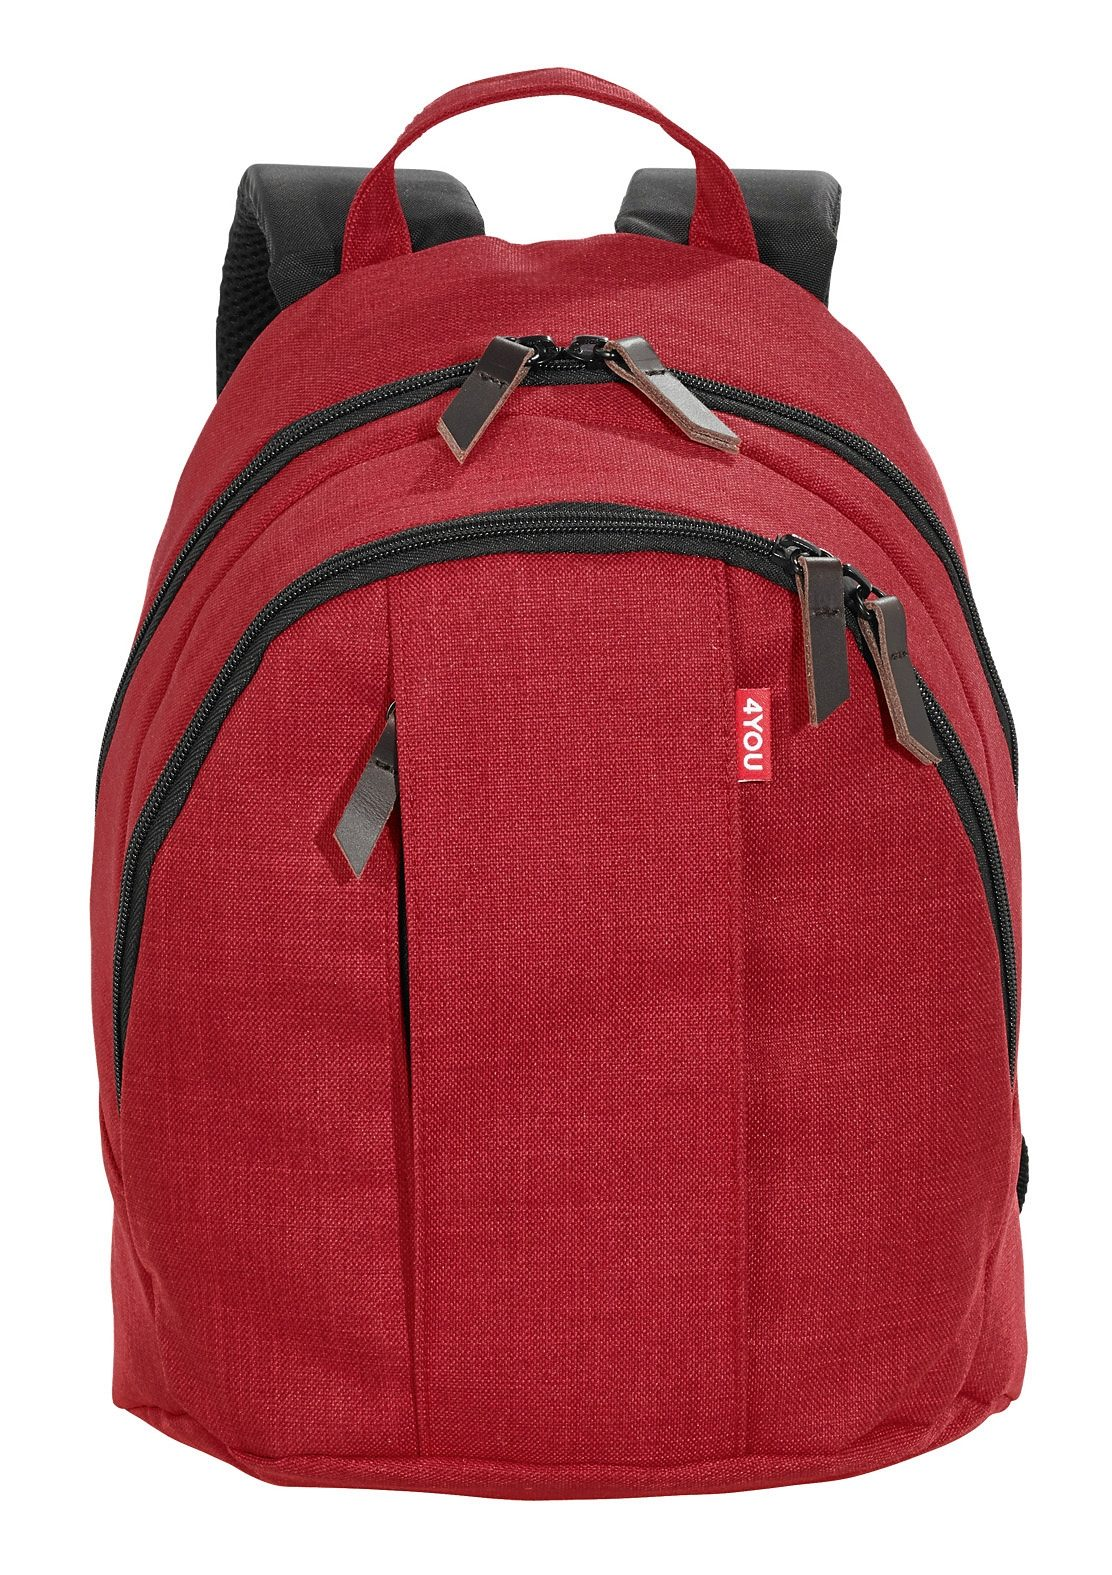 4YOU Rucksack, Soft Red, »Minirucksack«